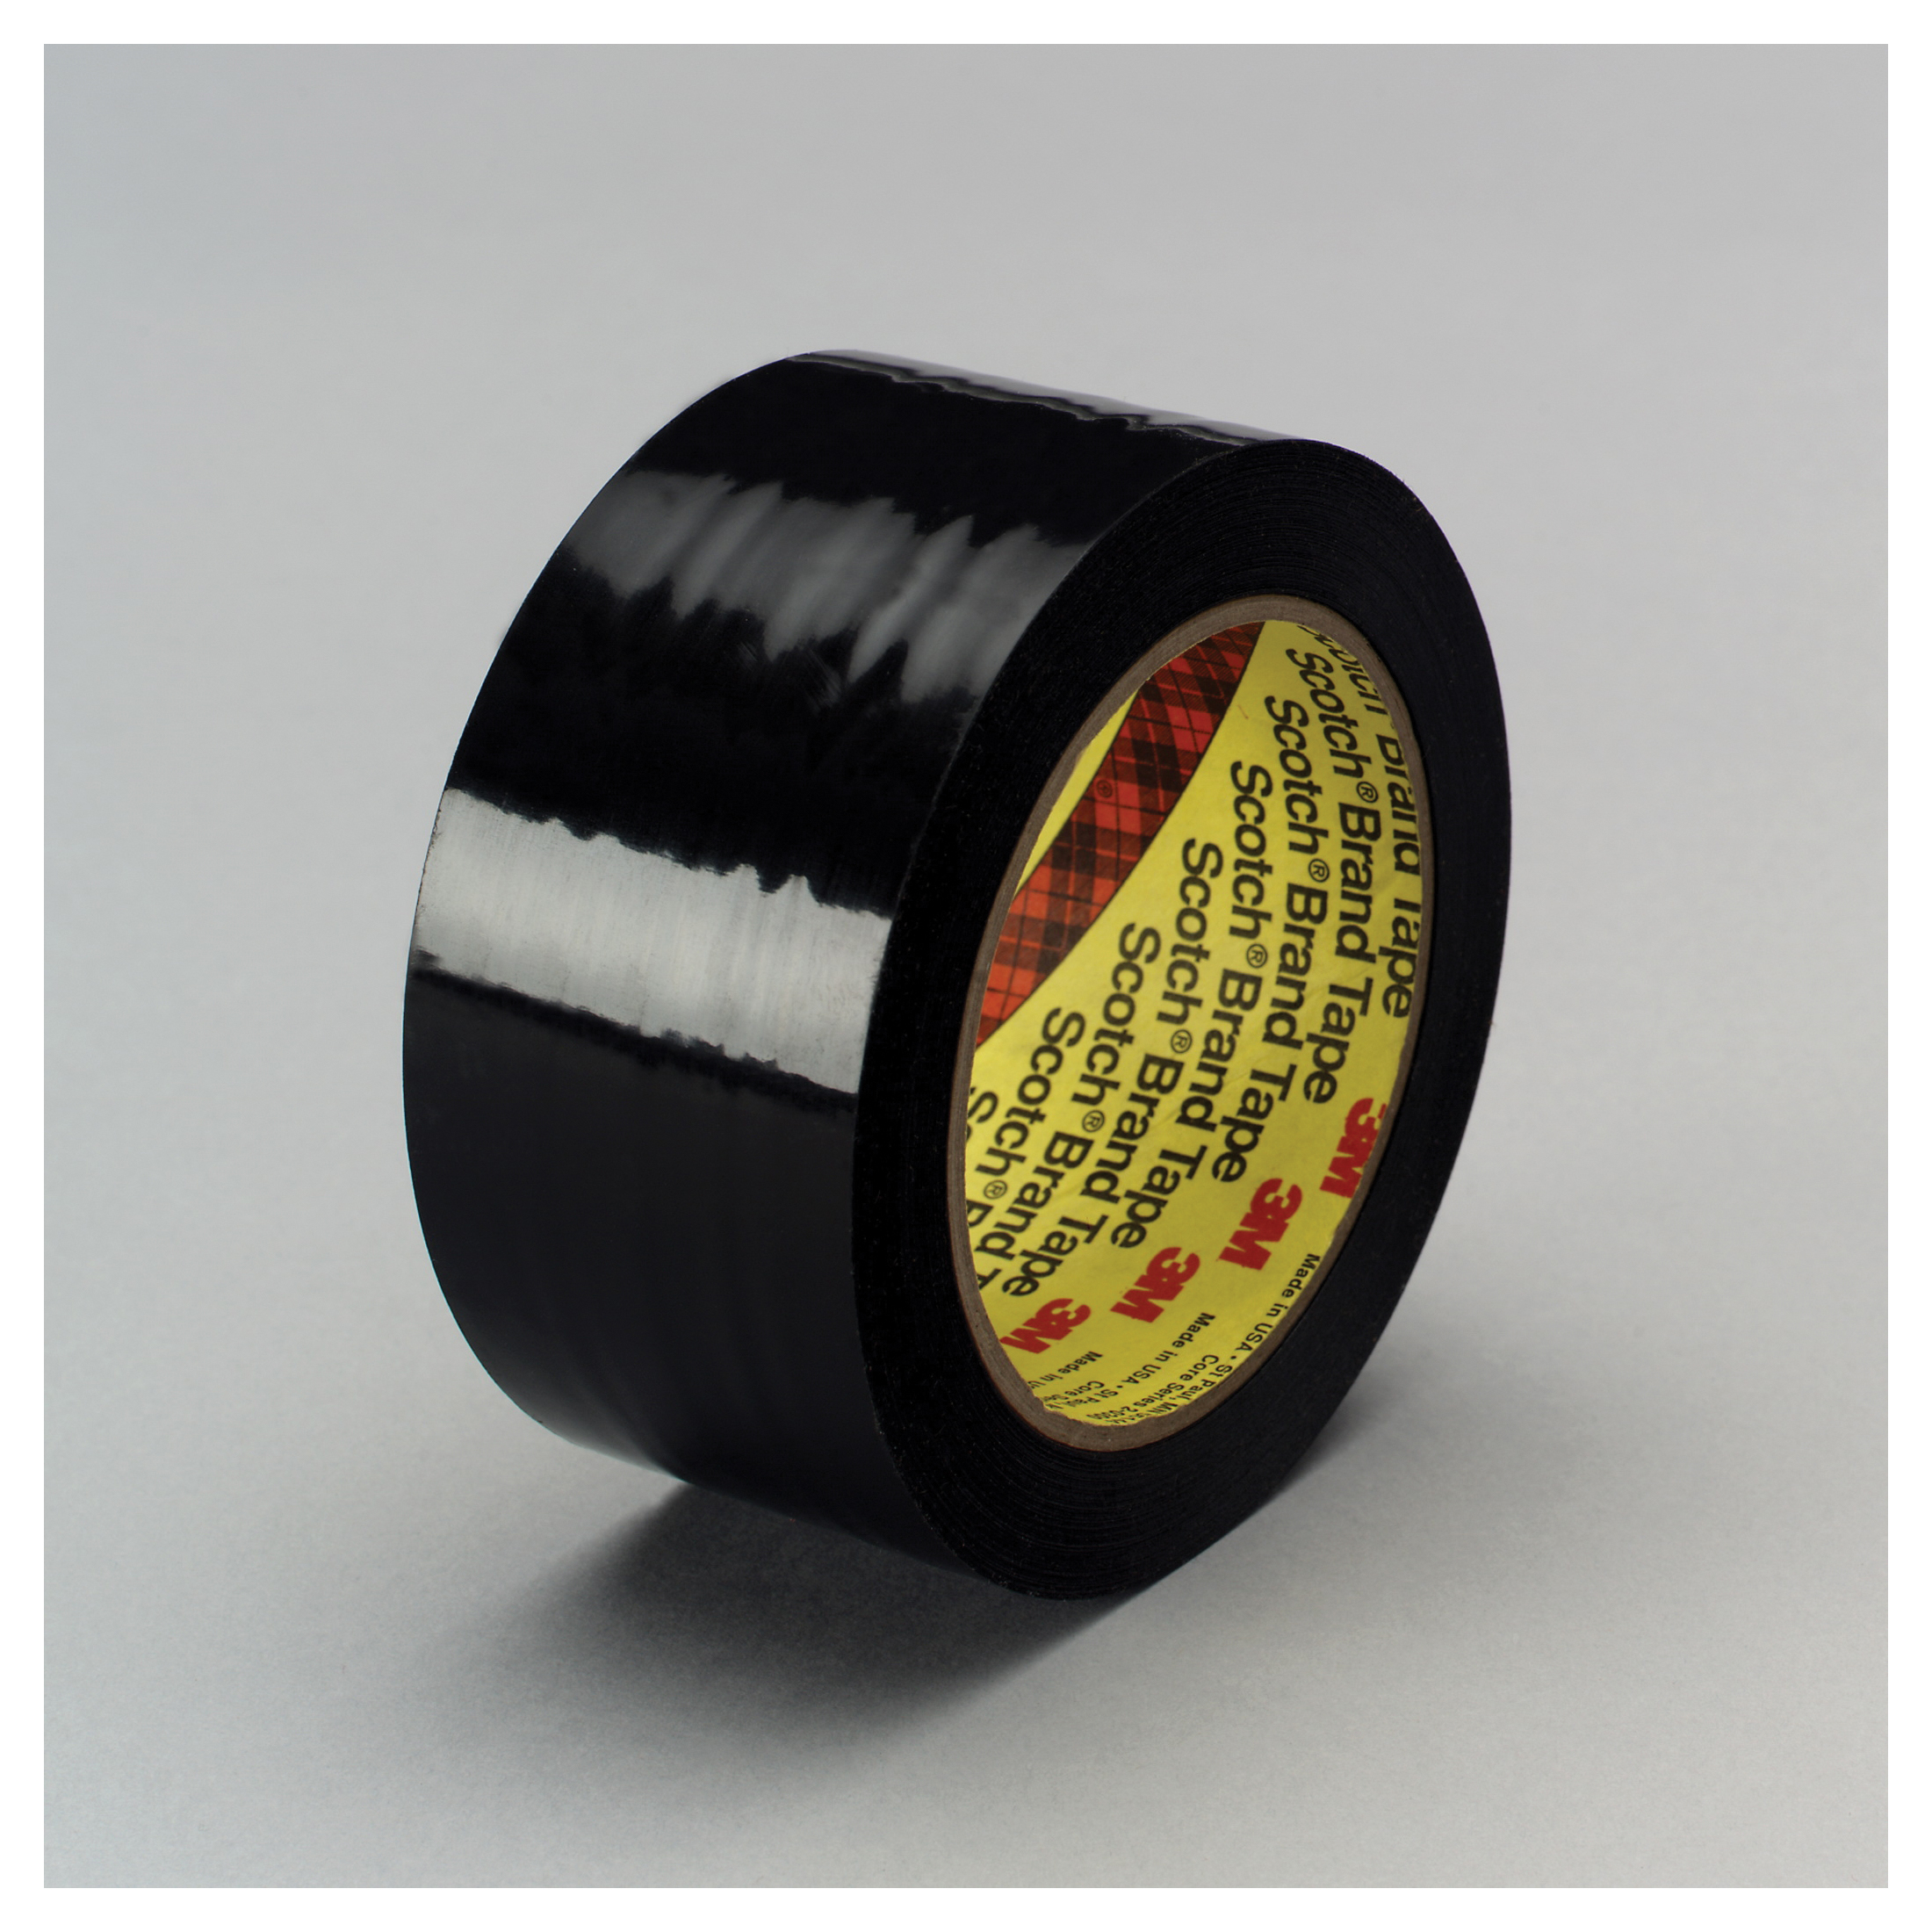 3M™ 021200-05167 483 Chemical Resistant General Purpose UV Resistant Masking Tape, 1 in W x 36 yd Roll L, 5 mil THK, Black